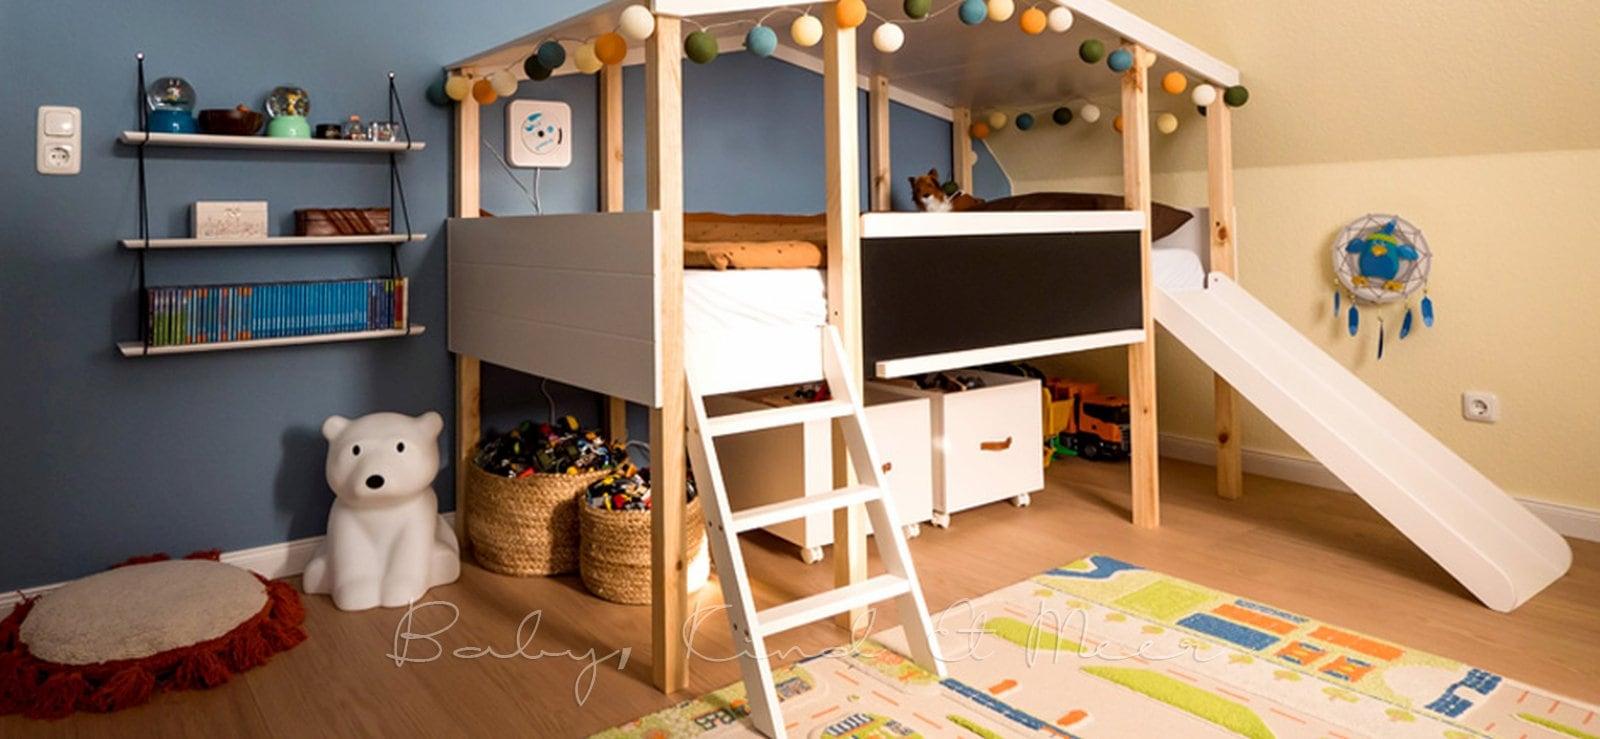 Full Size of Kinderzimmer Aufbewahrung Ikea Spielzeug Aufbewahrungskorb Aufbewahrungssystem Gross Regal Grau Mint Blau Aufbewahrungsboxen Gebraucht Aufbewahrungsregal Kinderzimmer Kinderzimmer Aufbewahrung